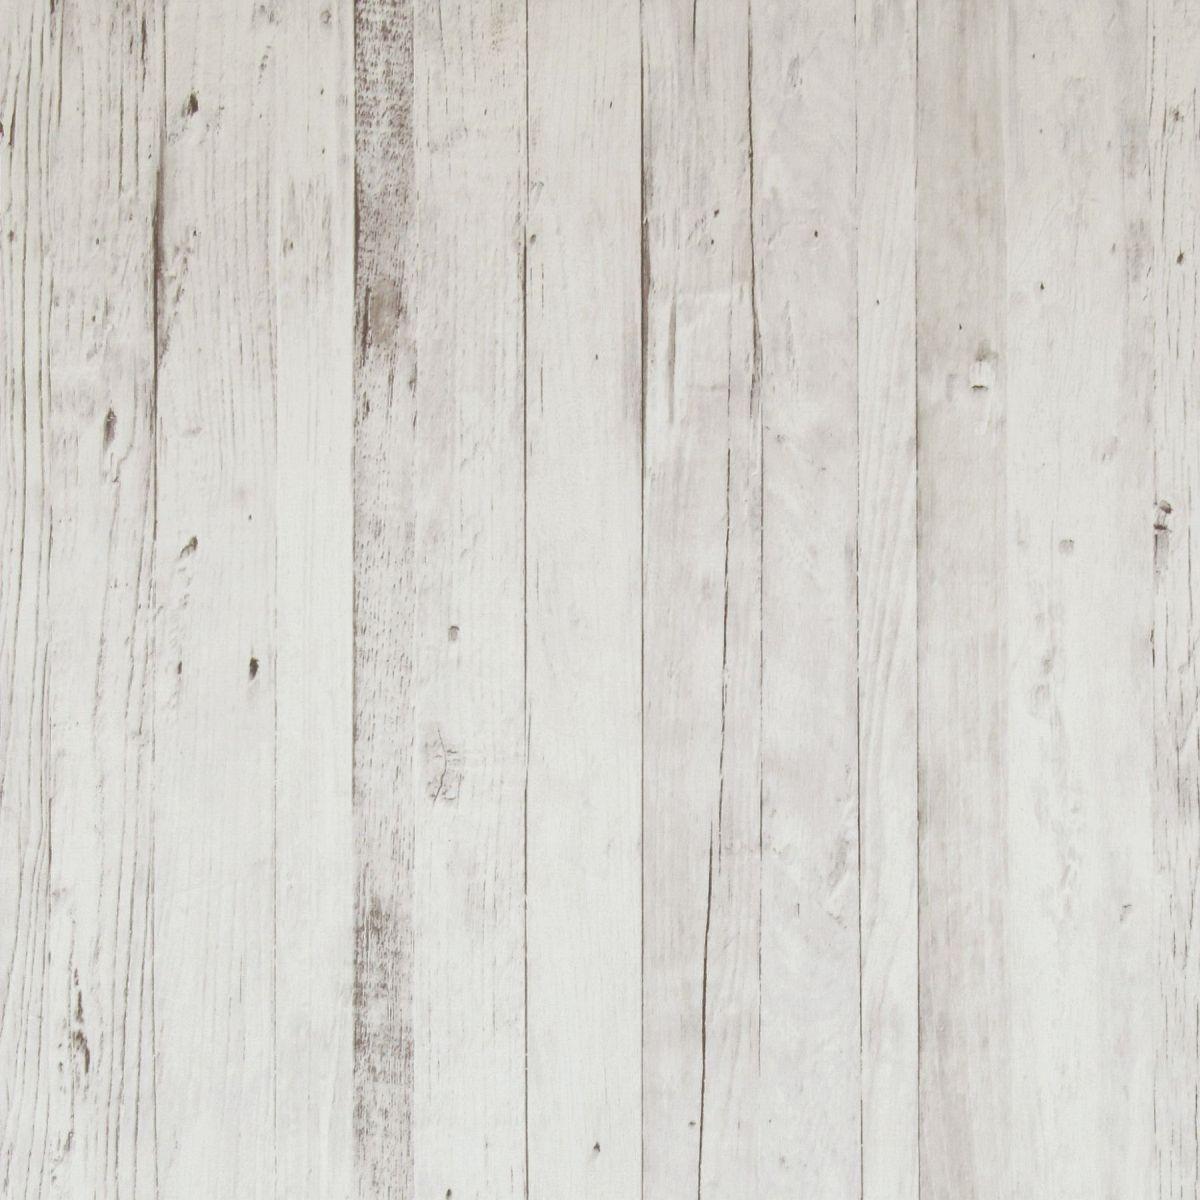 hochwertige tapeten und stoffe b n wallcoverings vliestapete riviera maison 18292 decowunder. Black Bedroom Furniture Sets. Home Design Ideas